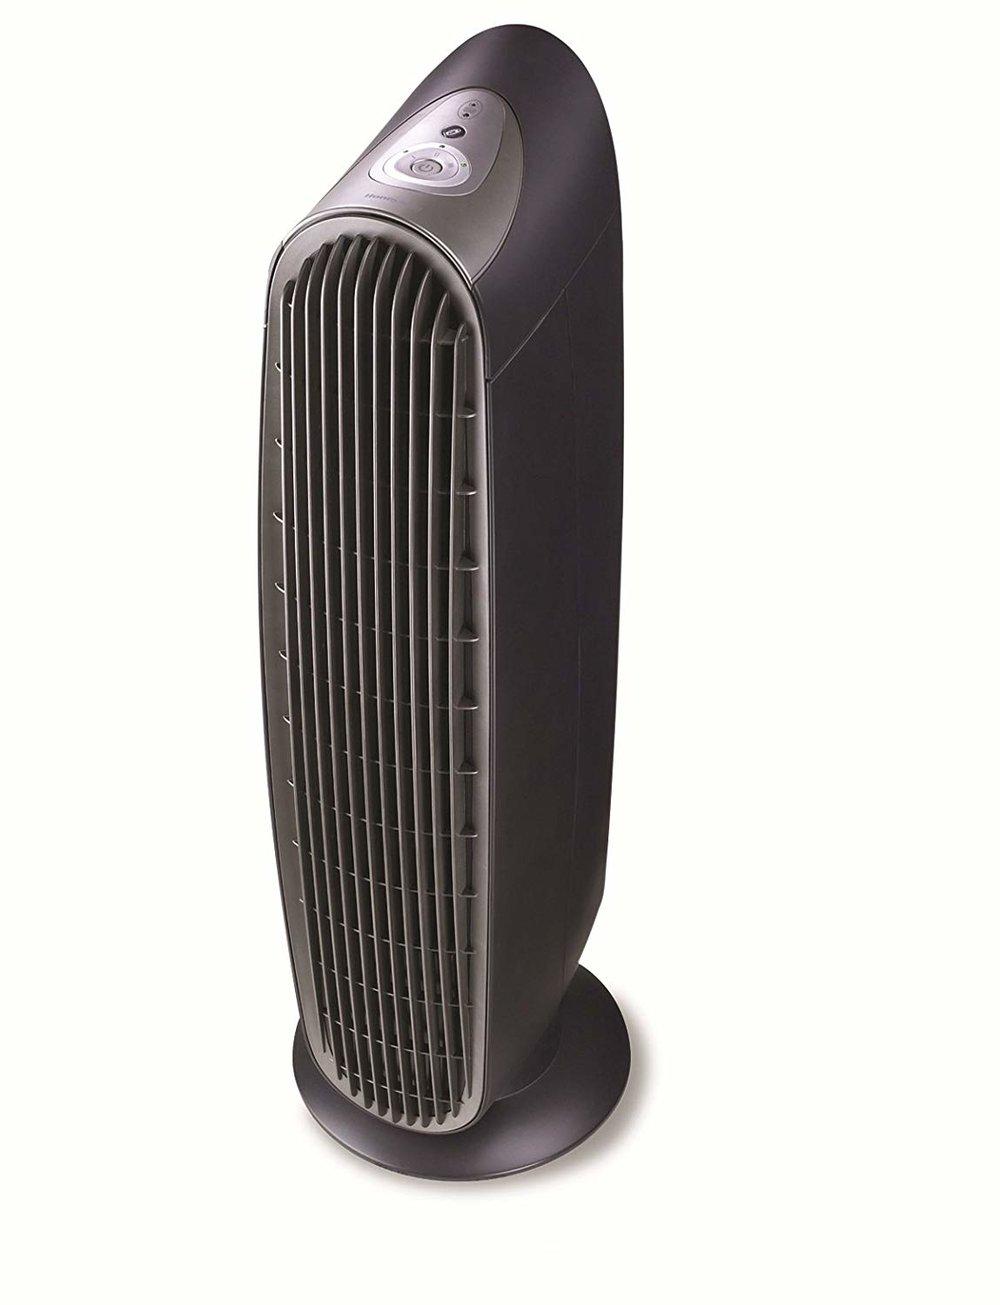 honeywell-air-purifier-for-dust-allergy.jpg